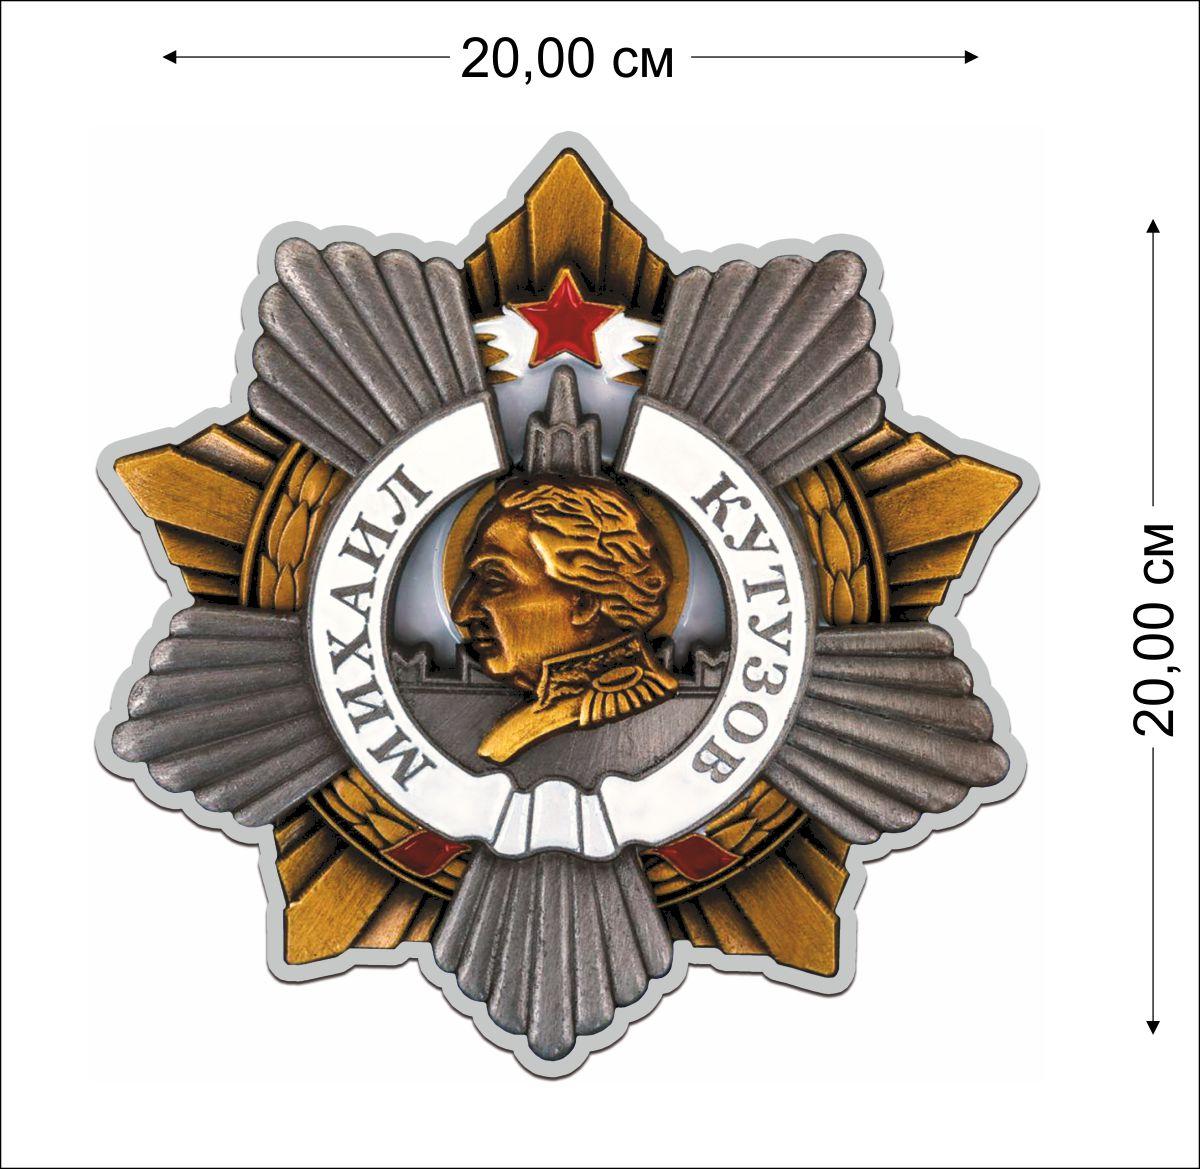 Наклейка с орденом Кутузова 1 степени